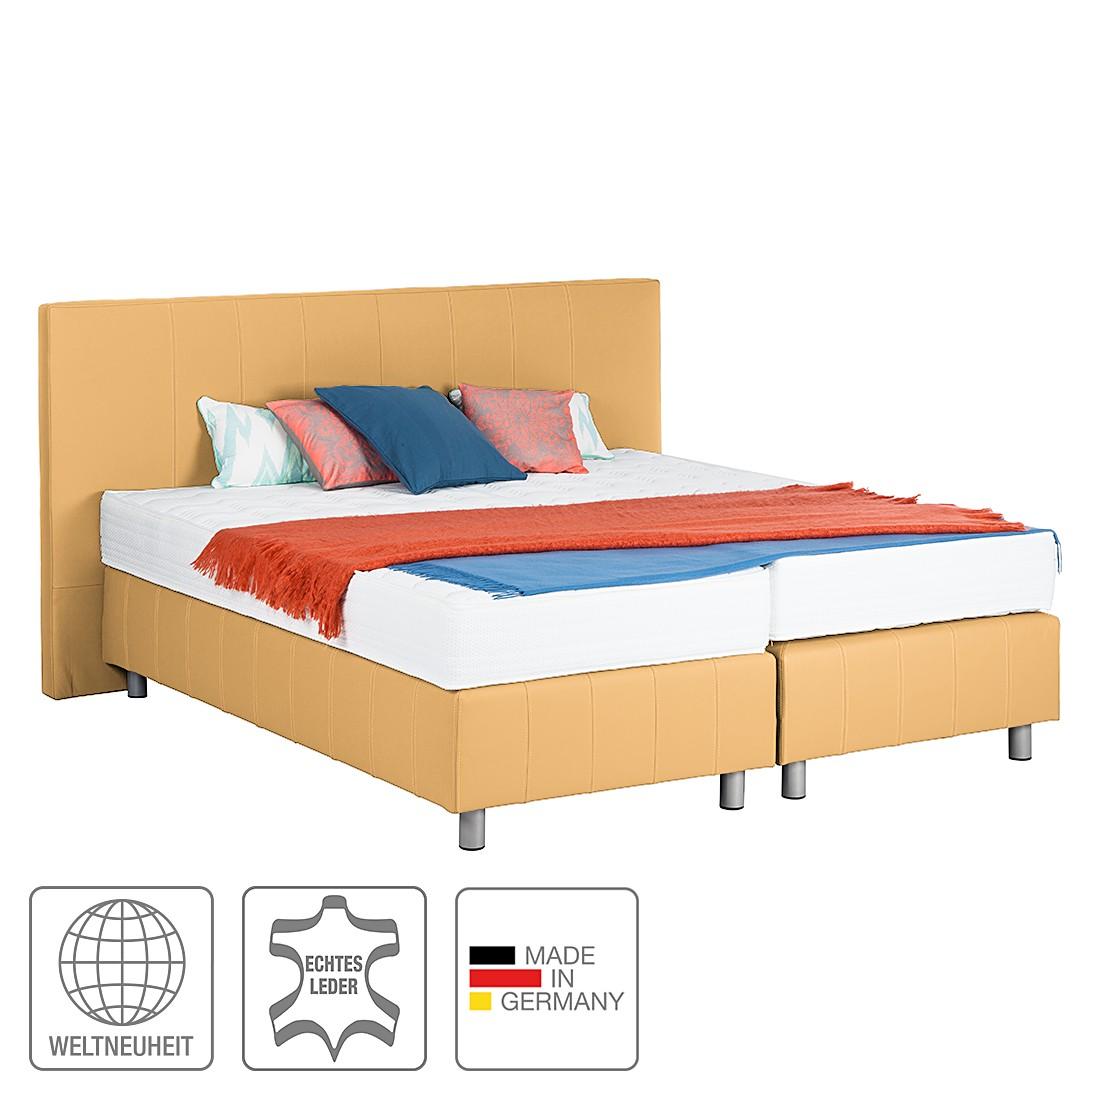 Boxspringbett Atlanta (Echtleder) - Ohne Topper - 160 x 200cm - H3 ab 80 kg - Gelb, Art of Sleep